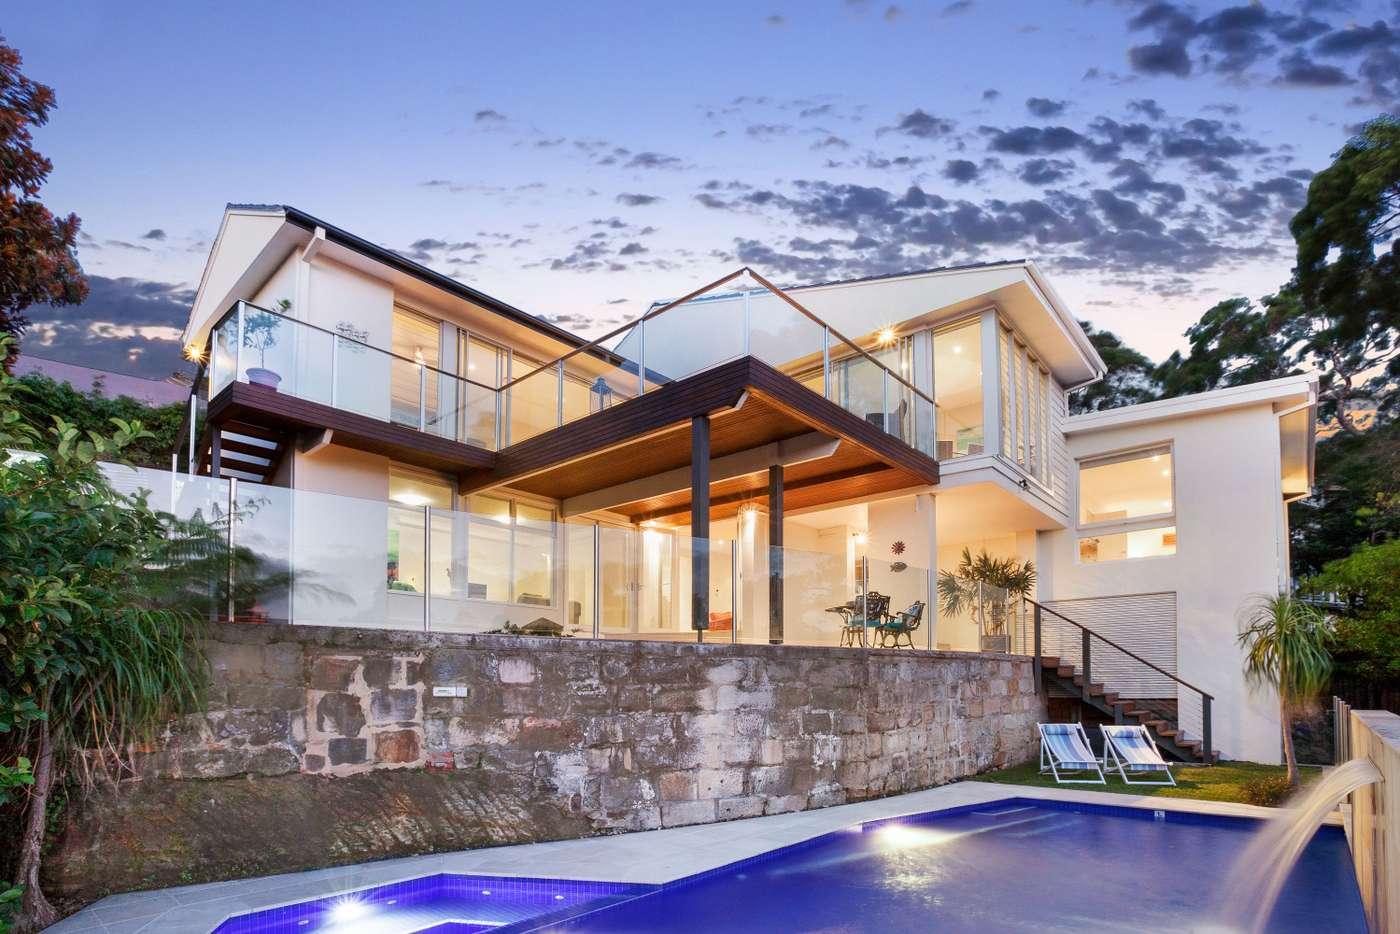 Main view of Homely house listing, 8 Koowong Avenue, Mosman NSW 2088